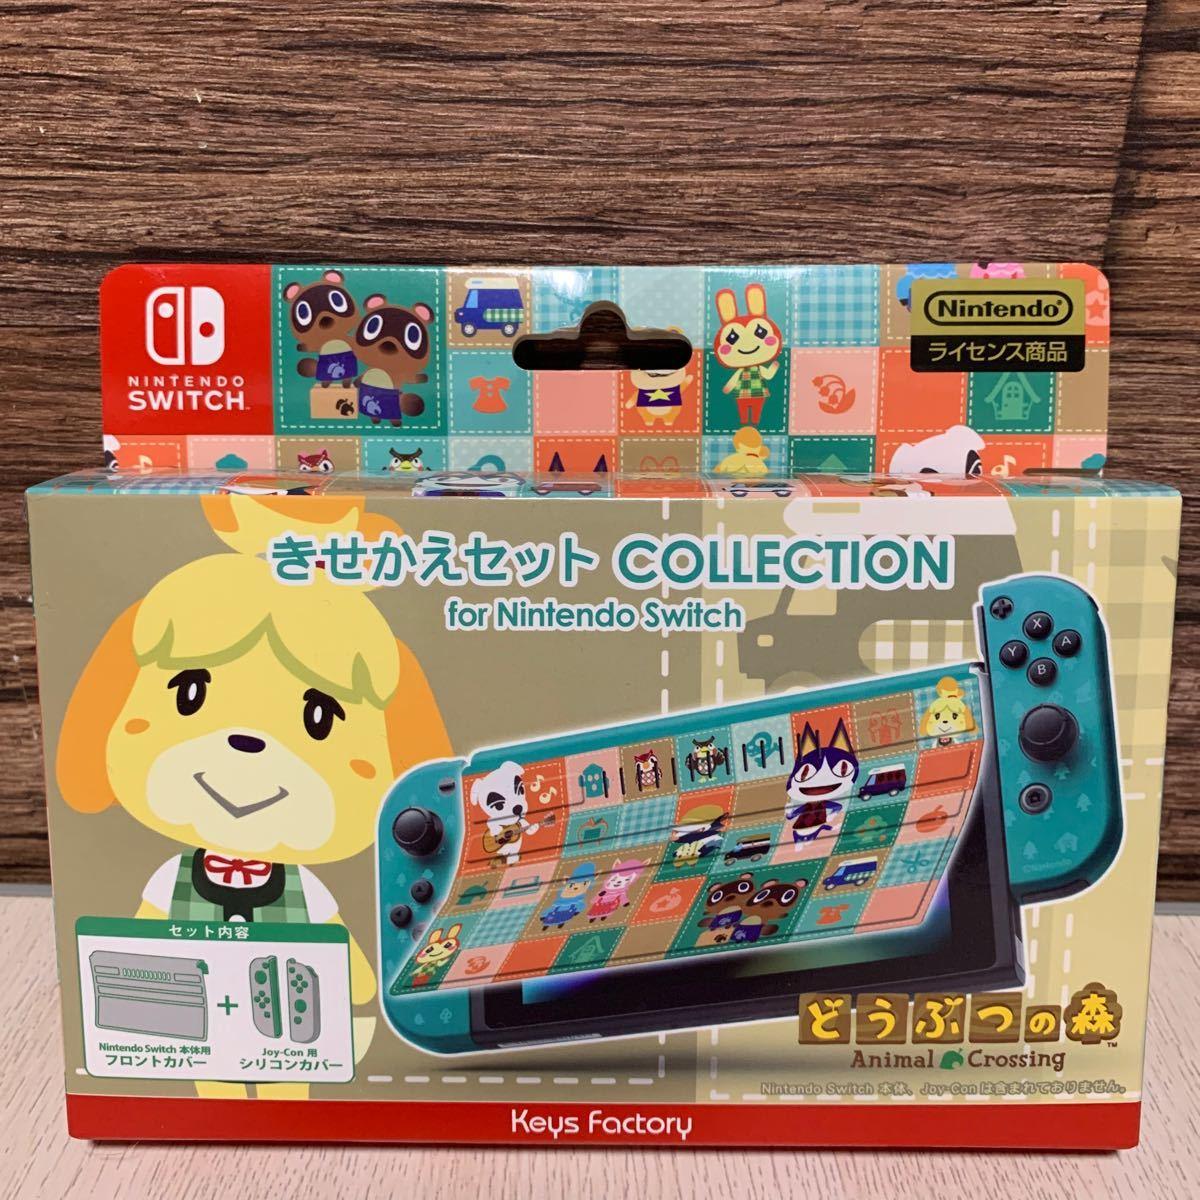 Switch きせかえセットコレクション for Nintendo Switch どうぶつの森 Type-A